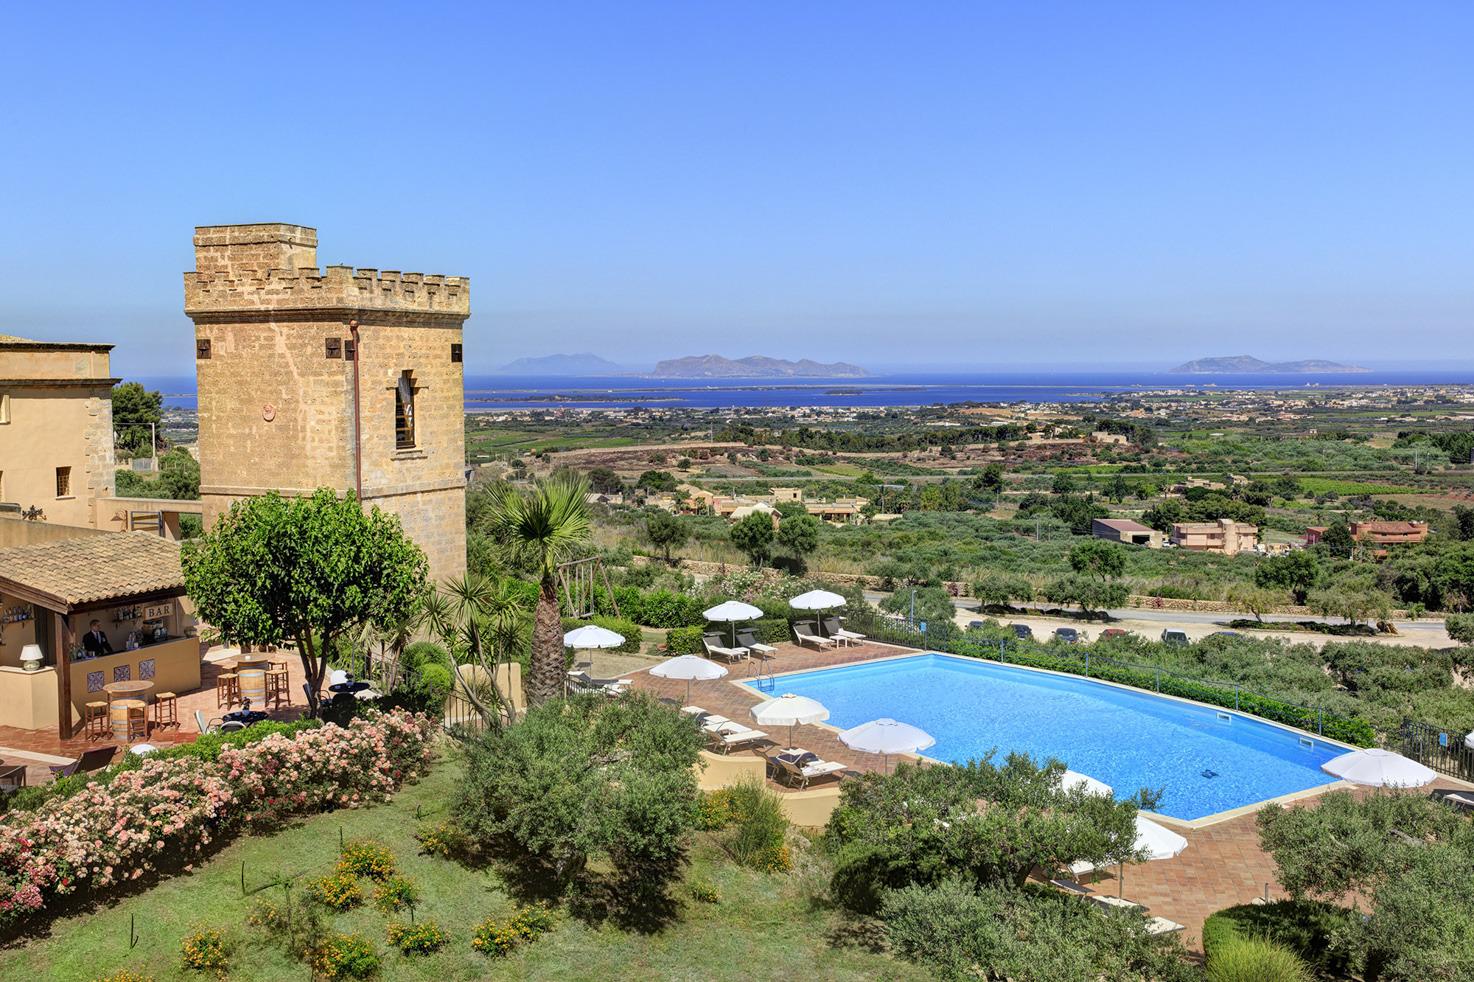 Panoramic view of Baglio Oneto